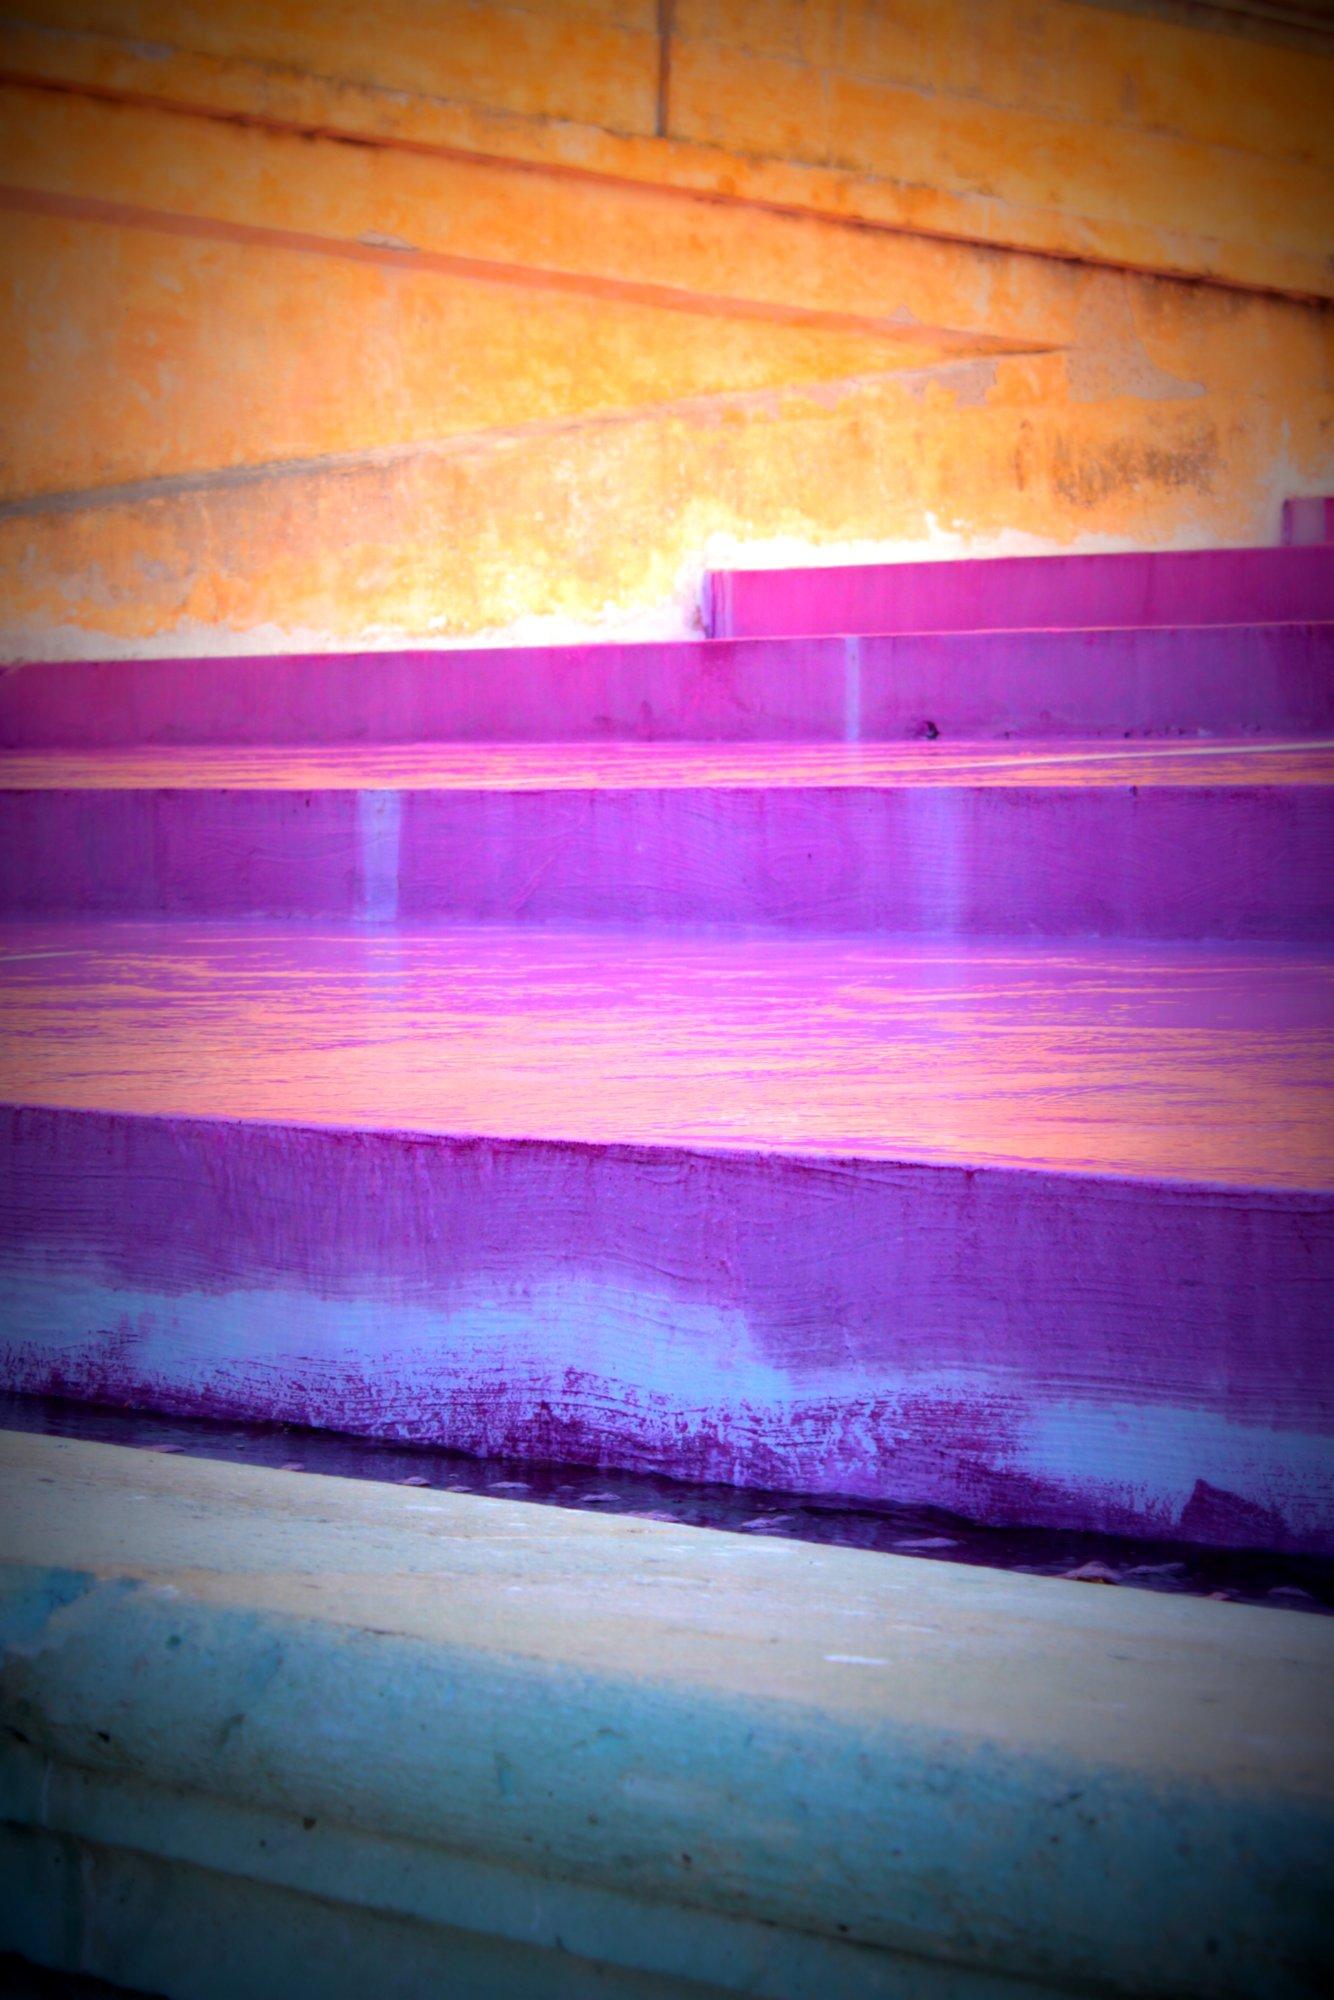 The hacienda's pink water fountain